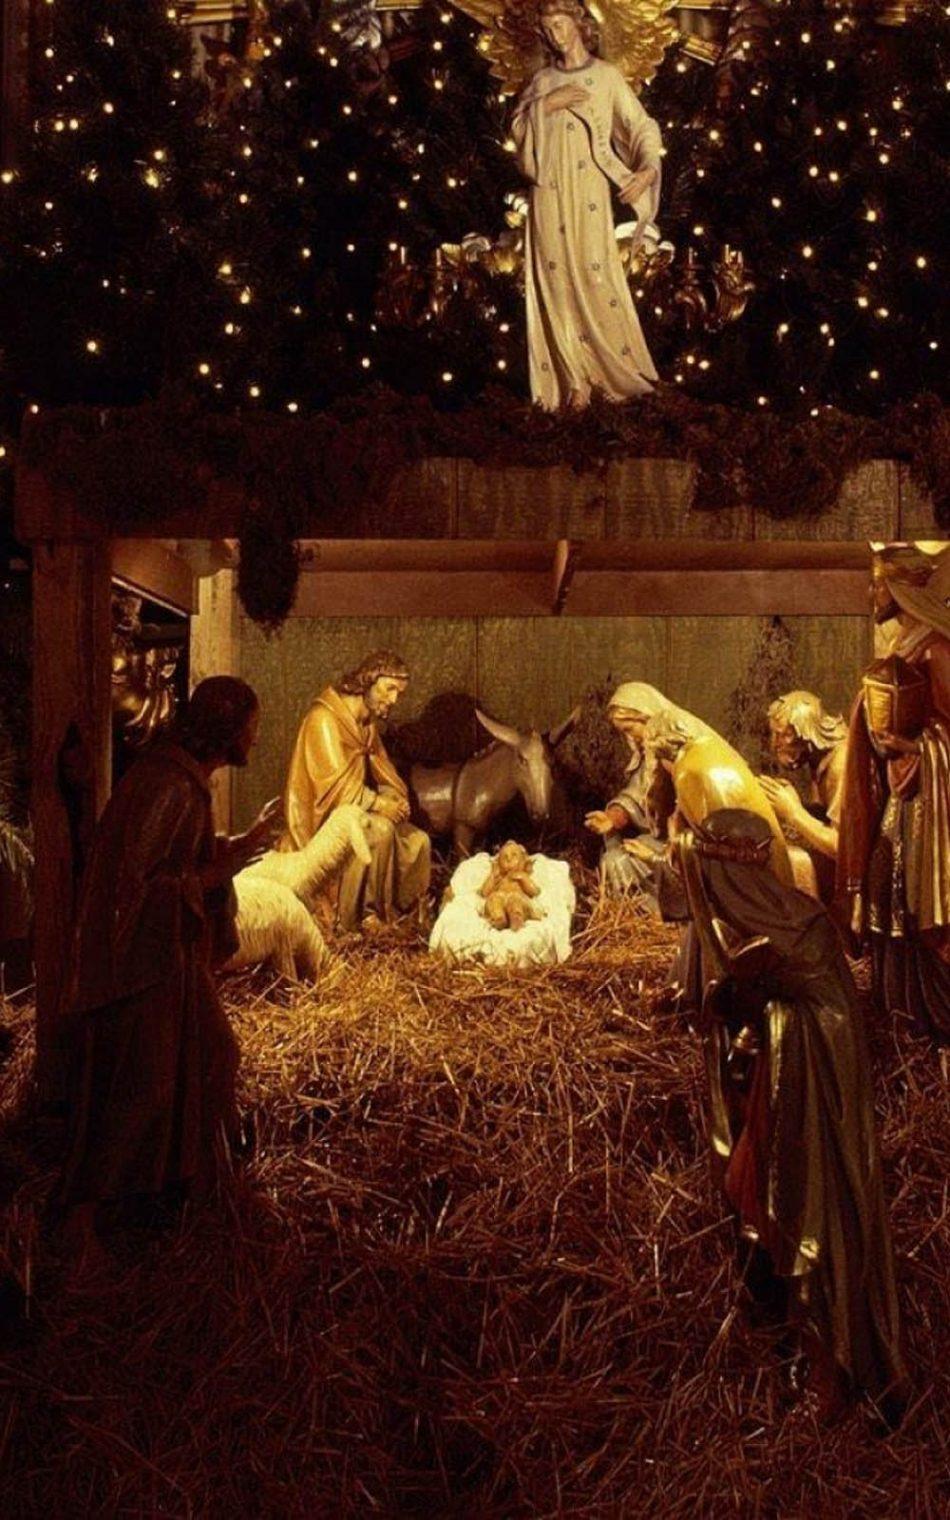 Christmas Jesus Nursery Decorations Free 4k Ultra Hd Mobile Wallpaper